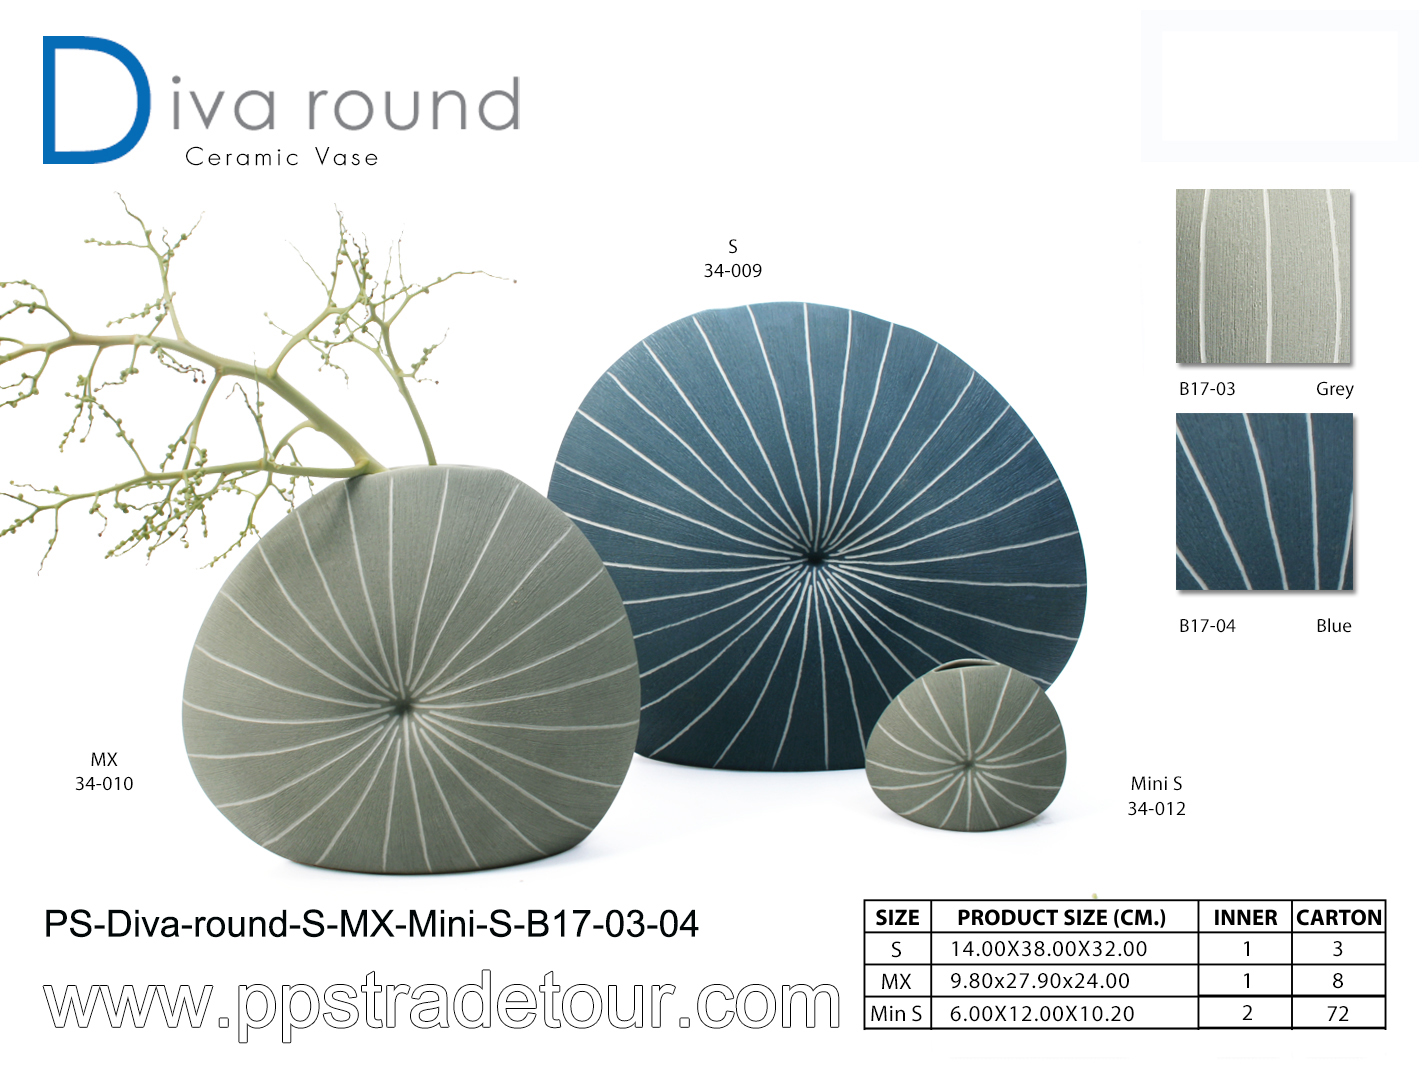 PSCV-Divaround-S-MX-Mini-S-B17-03-04